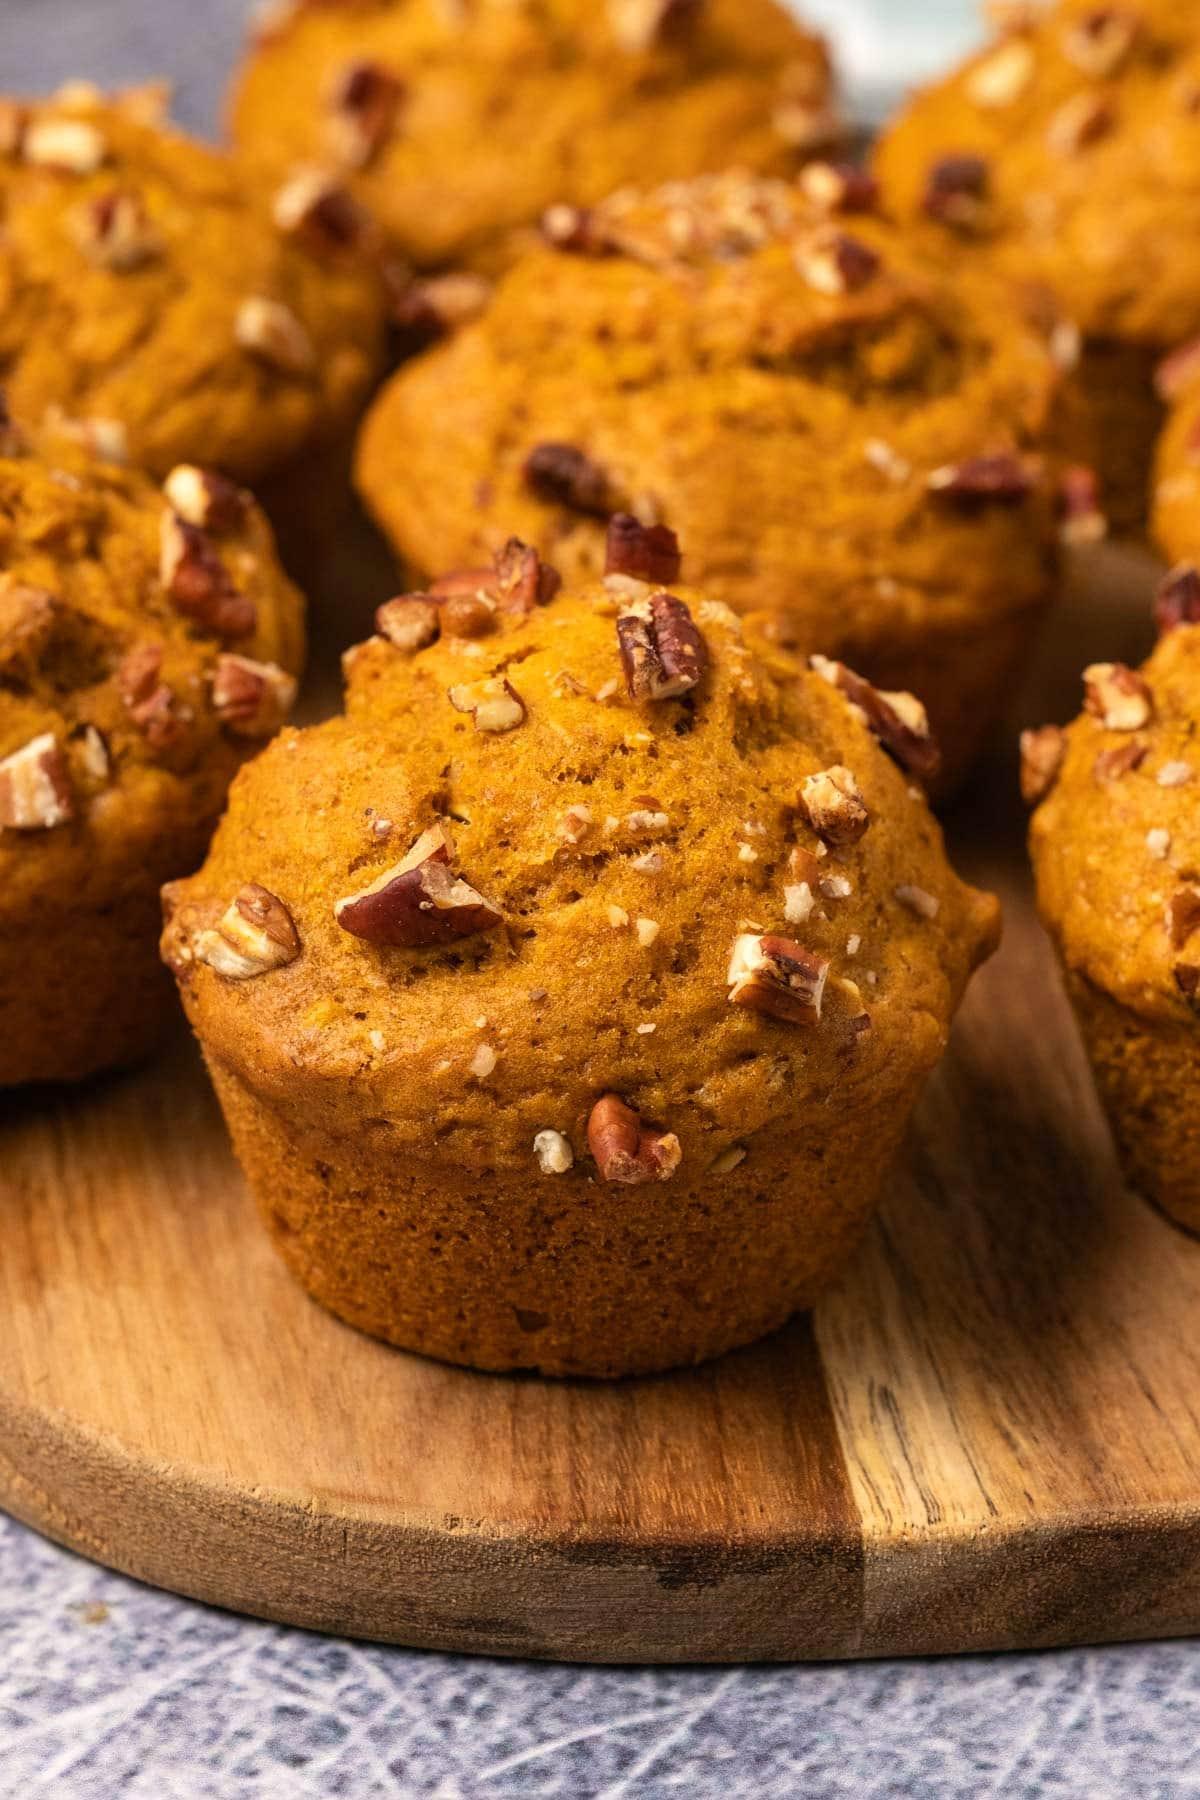 Pumpkin muffins on a wooden board.